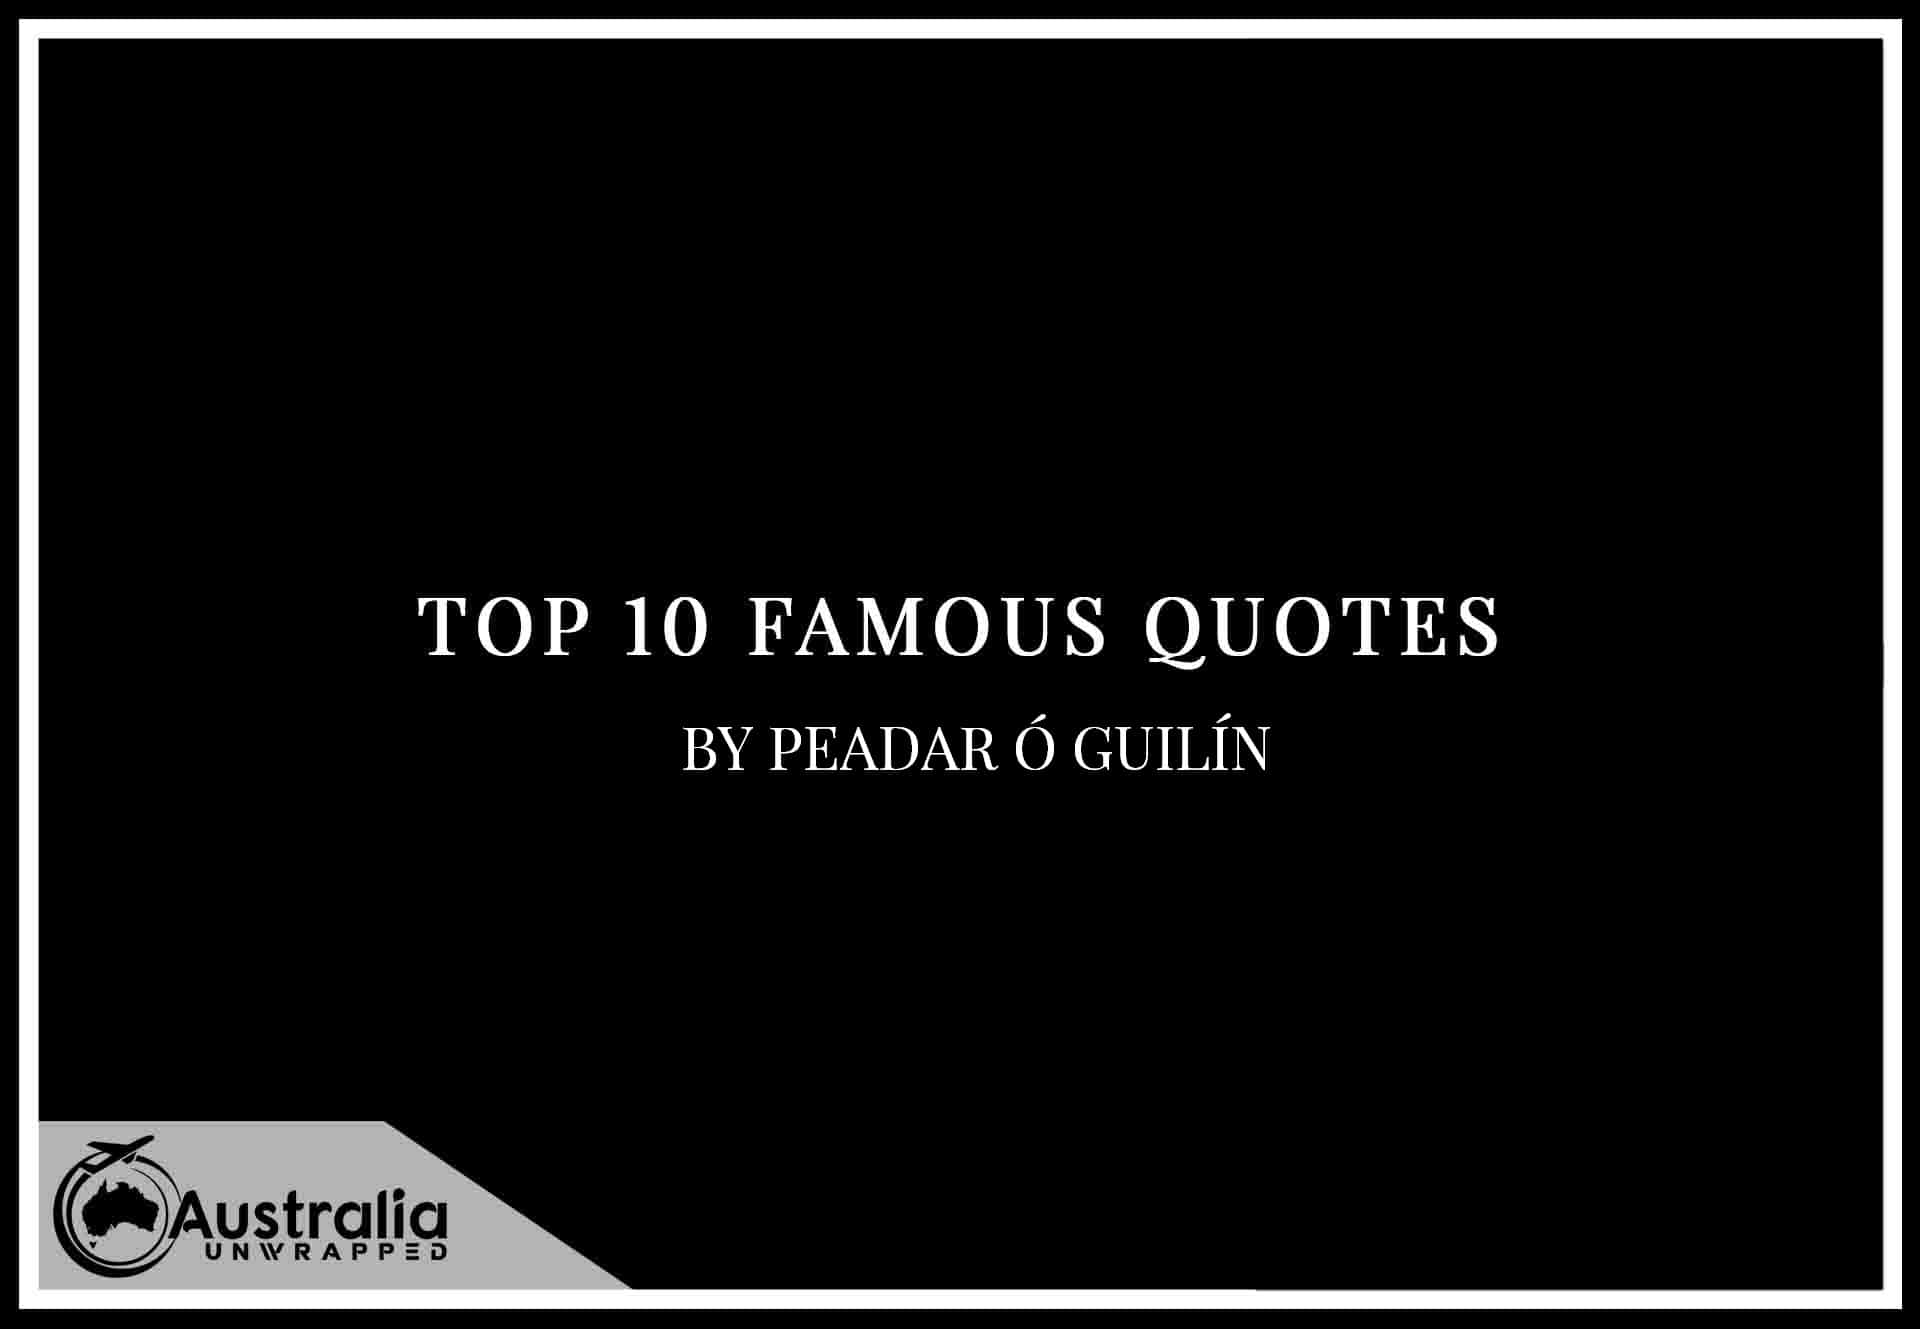 Top 10 Famous Quotes by Author Peadar Ó Guilín